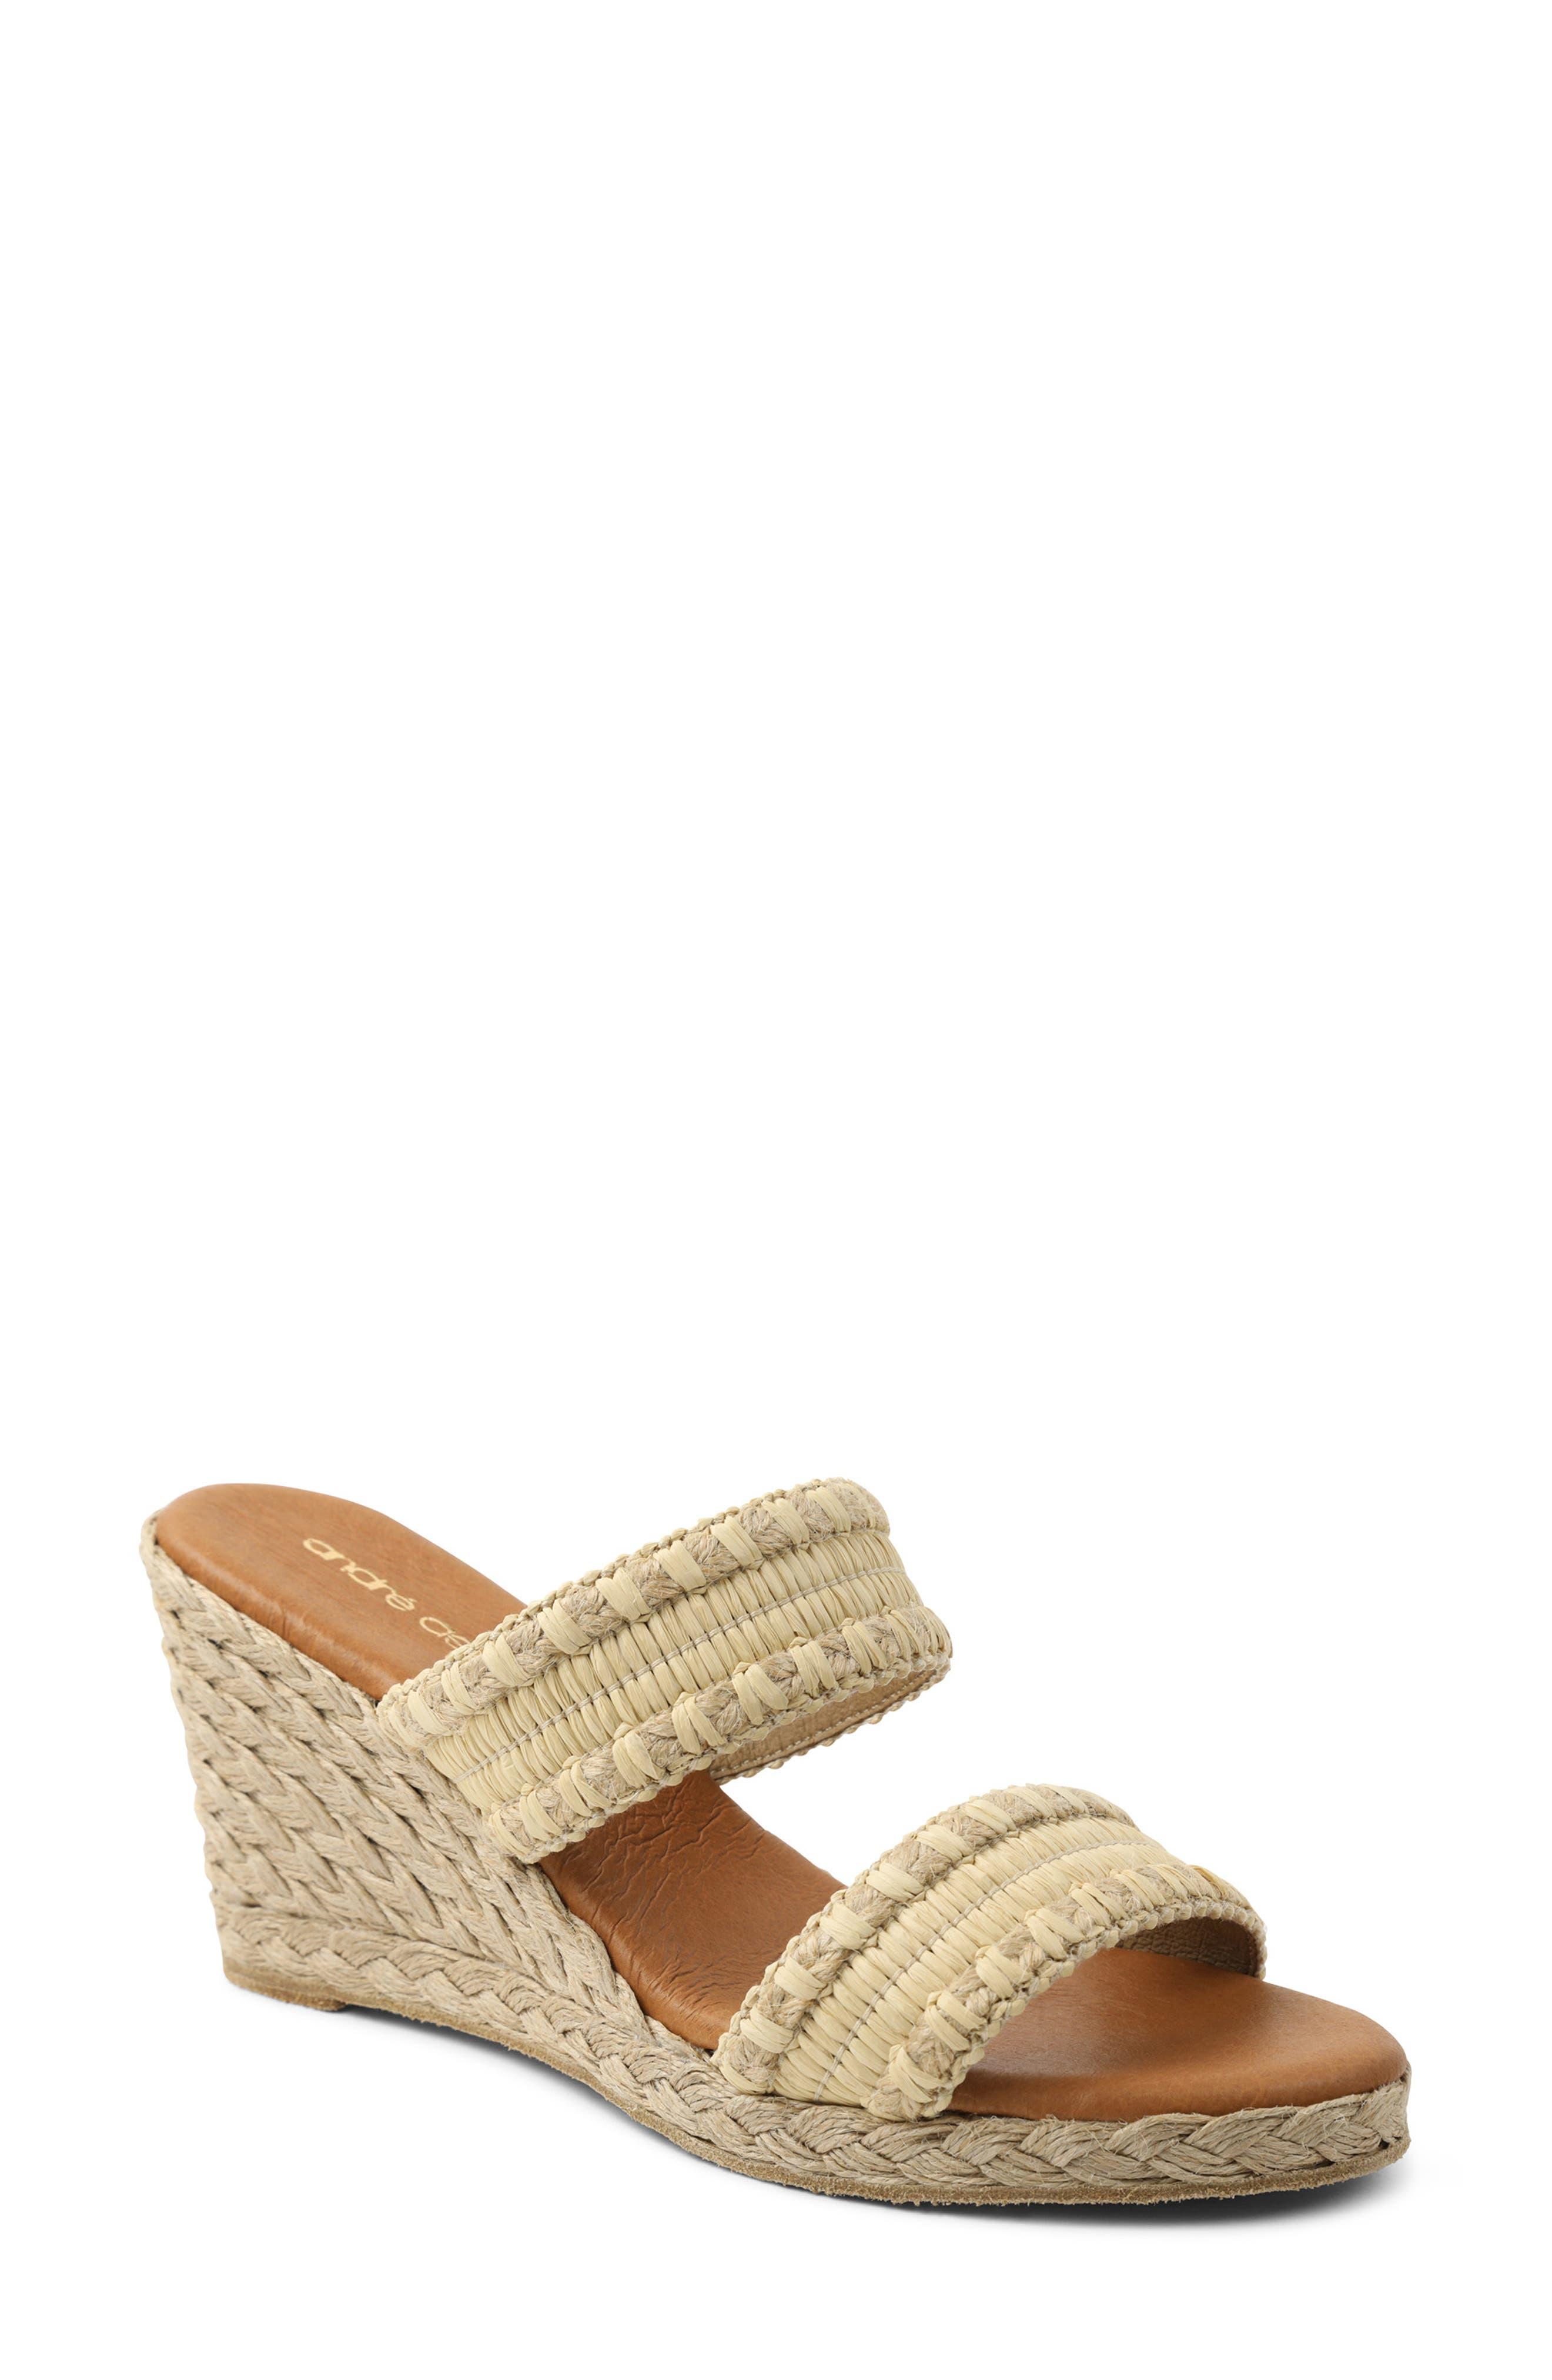 Nolita Raffia Wedge Slide Sandal